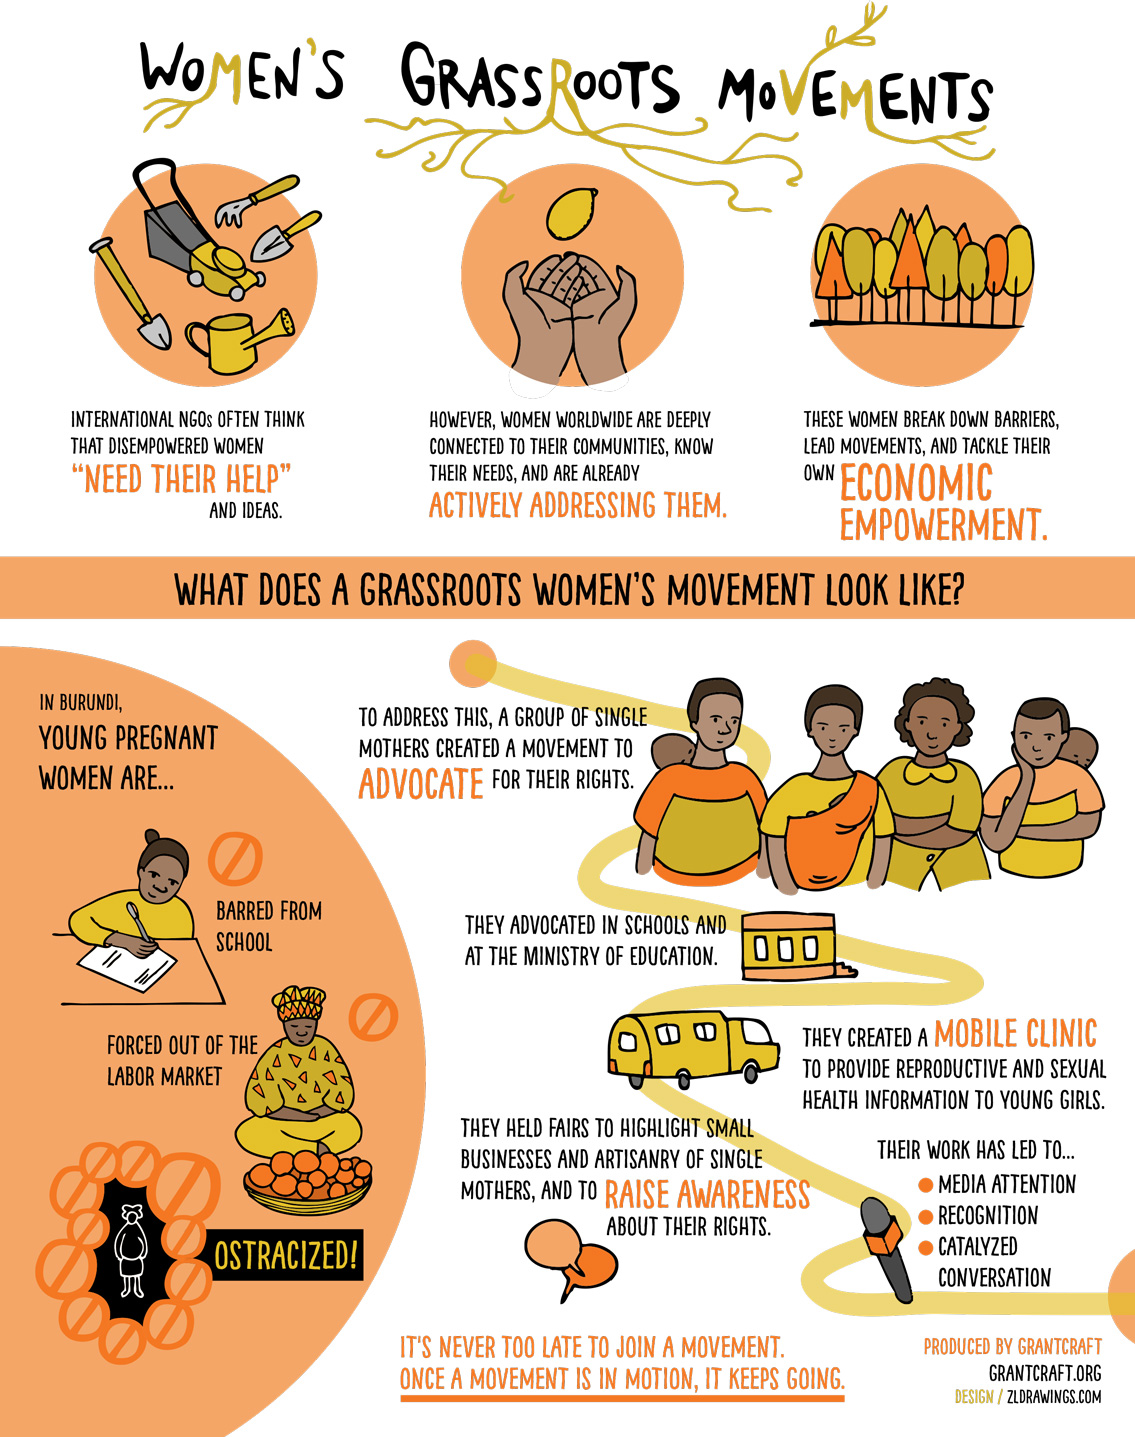 Women's Grassroots Movements